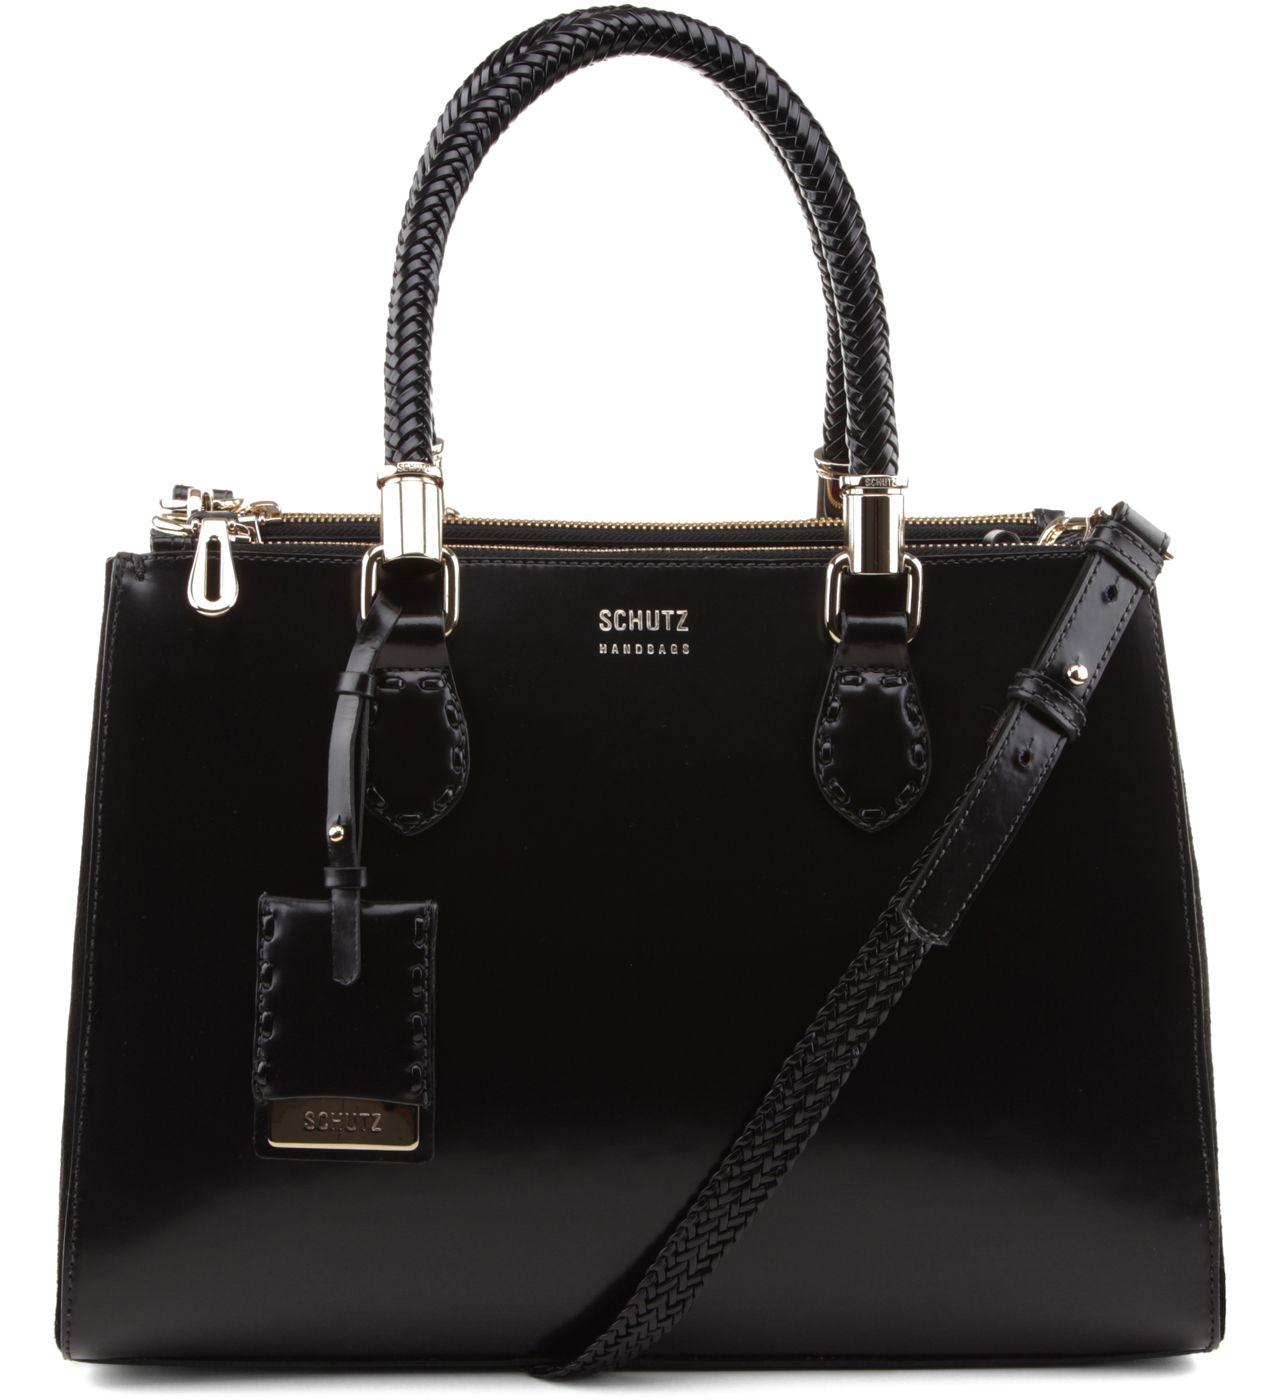 aecfe89a5 TOTE LORENA BLACK | Estilo | Pinterest | Black, Bag and Stylists